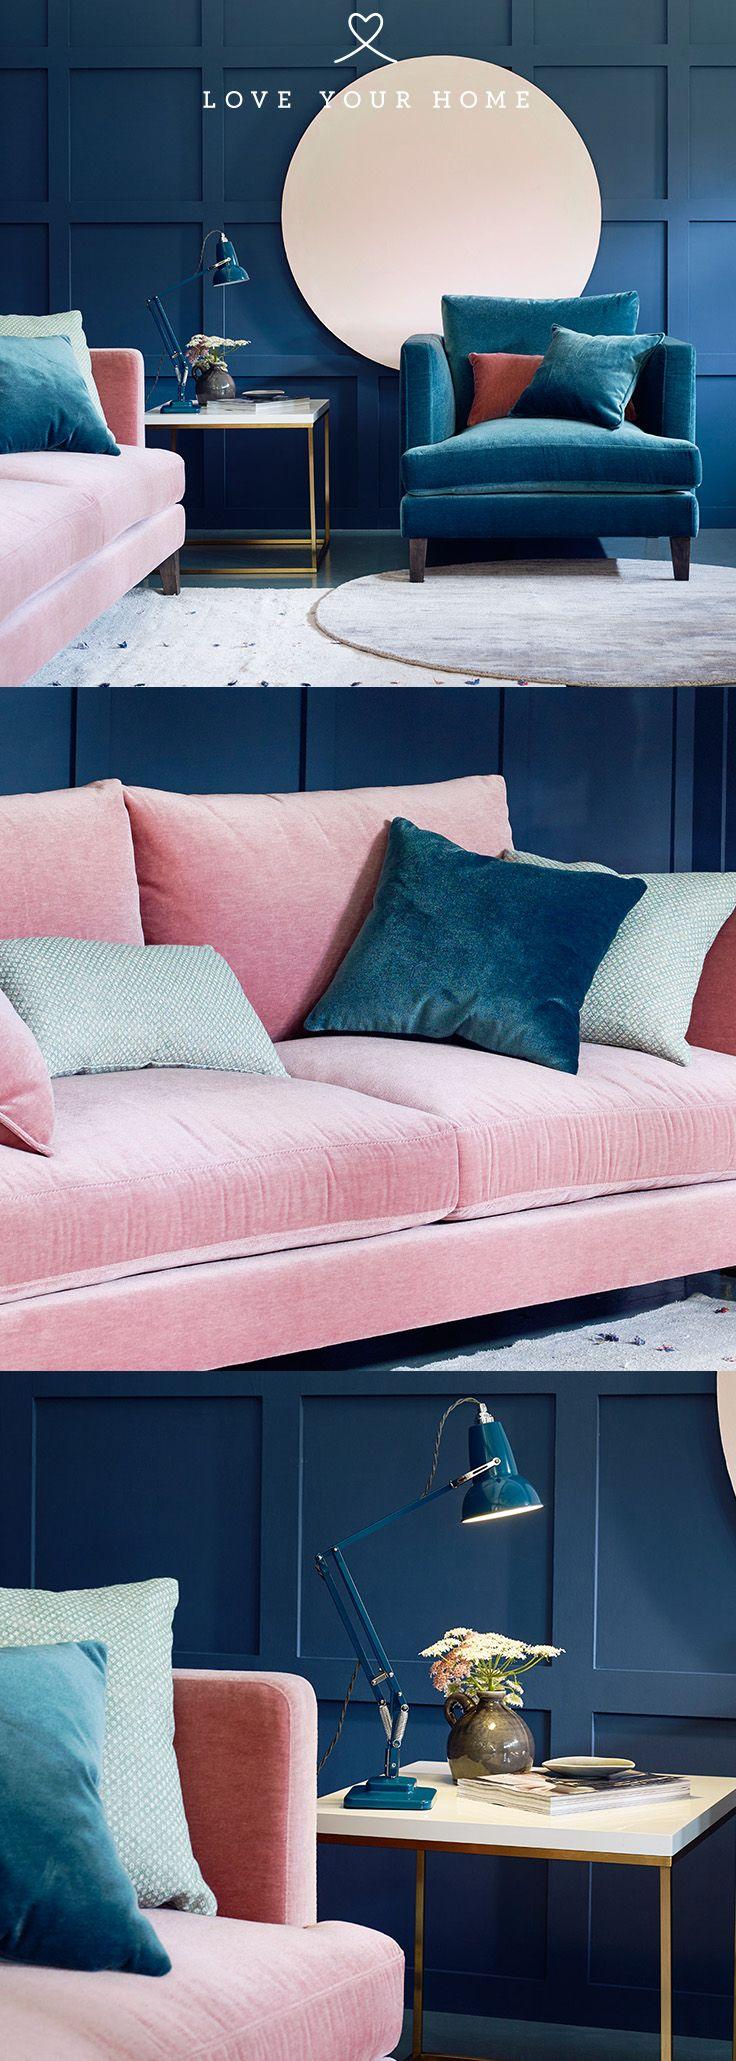 Marlon Modern Sofa in 2020 | Living room decor blue sofa ...